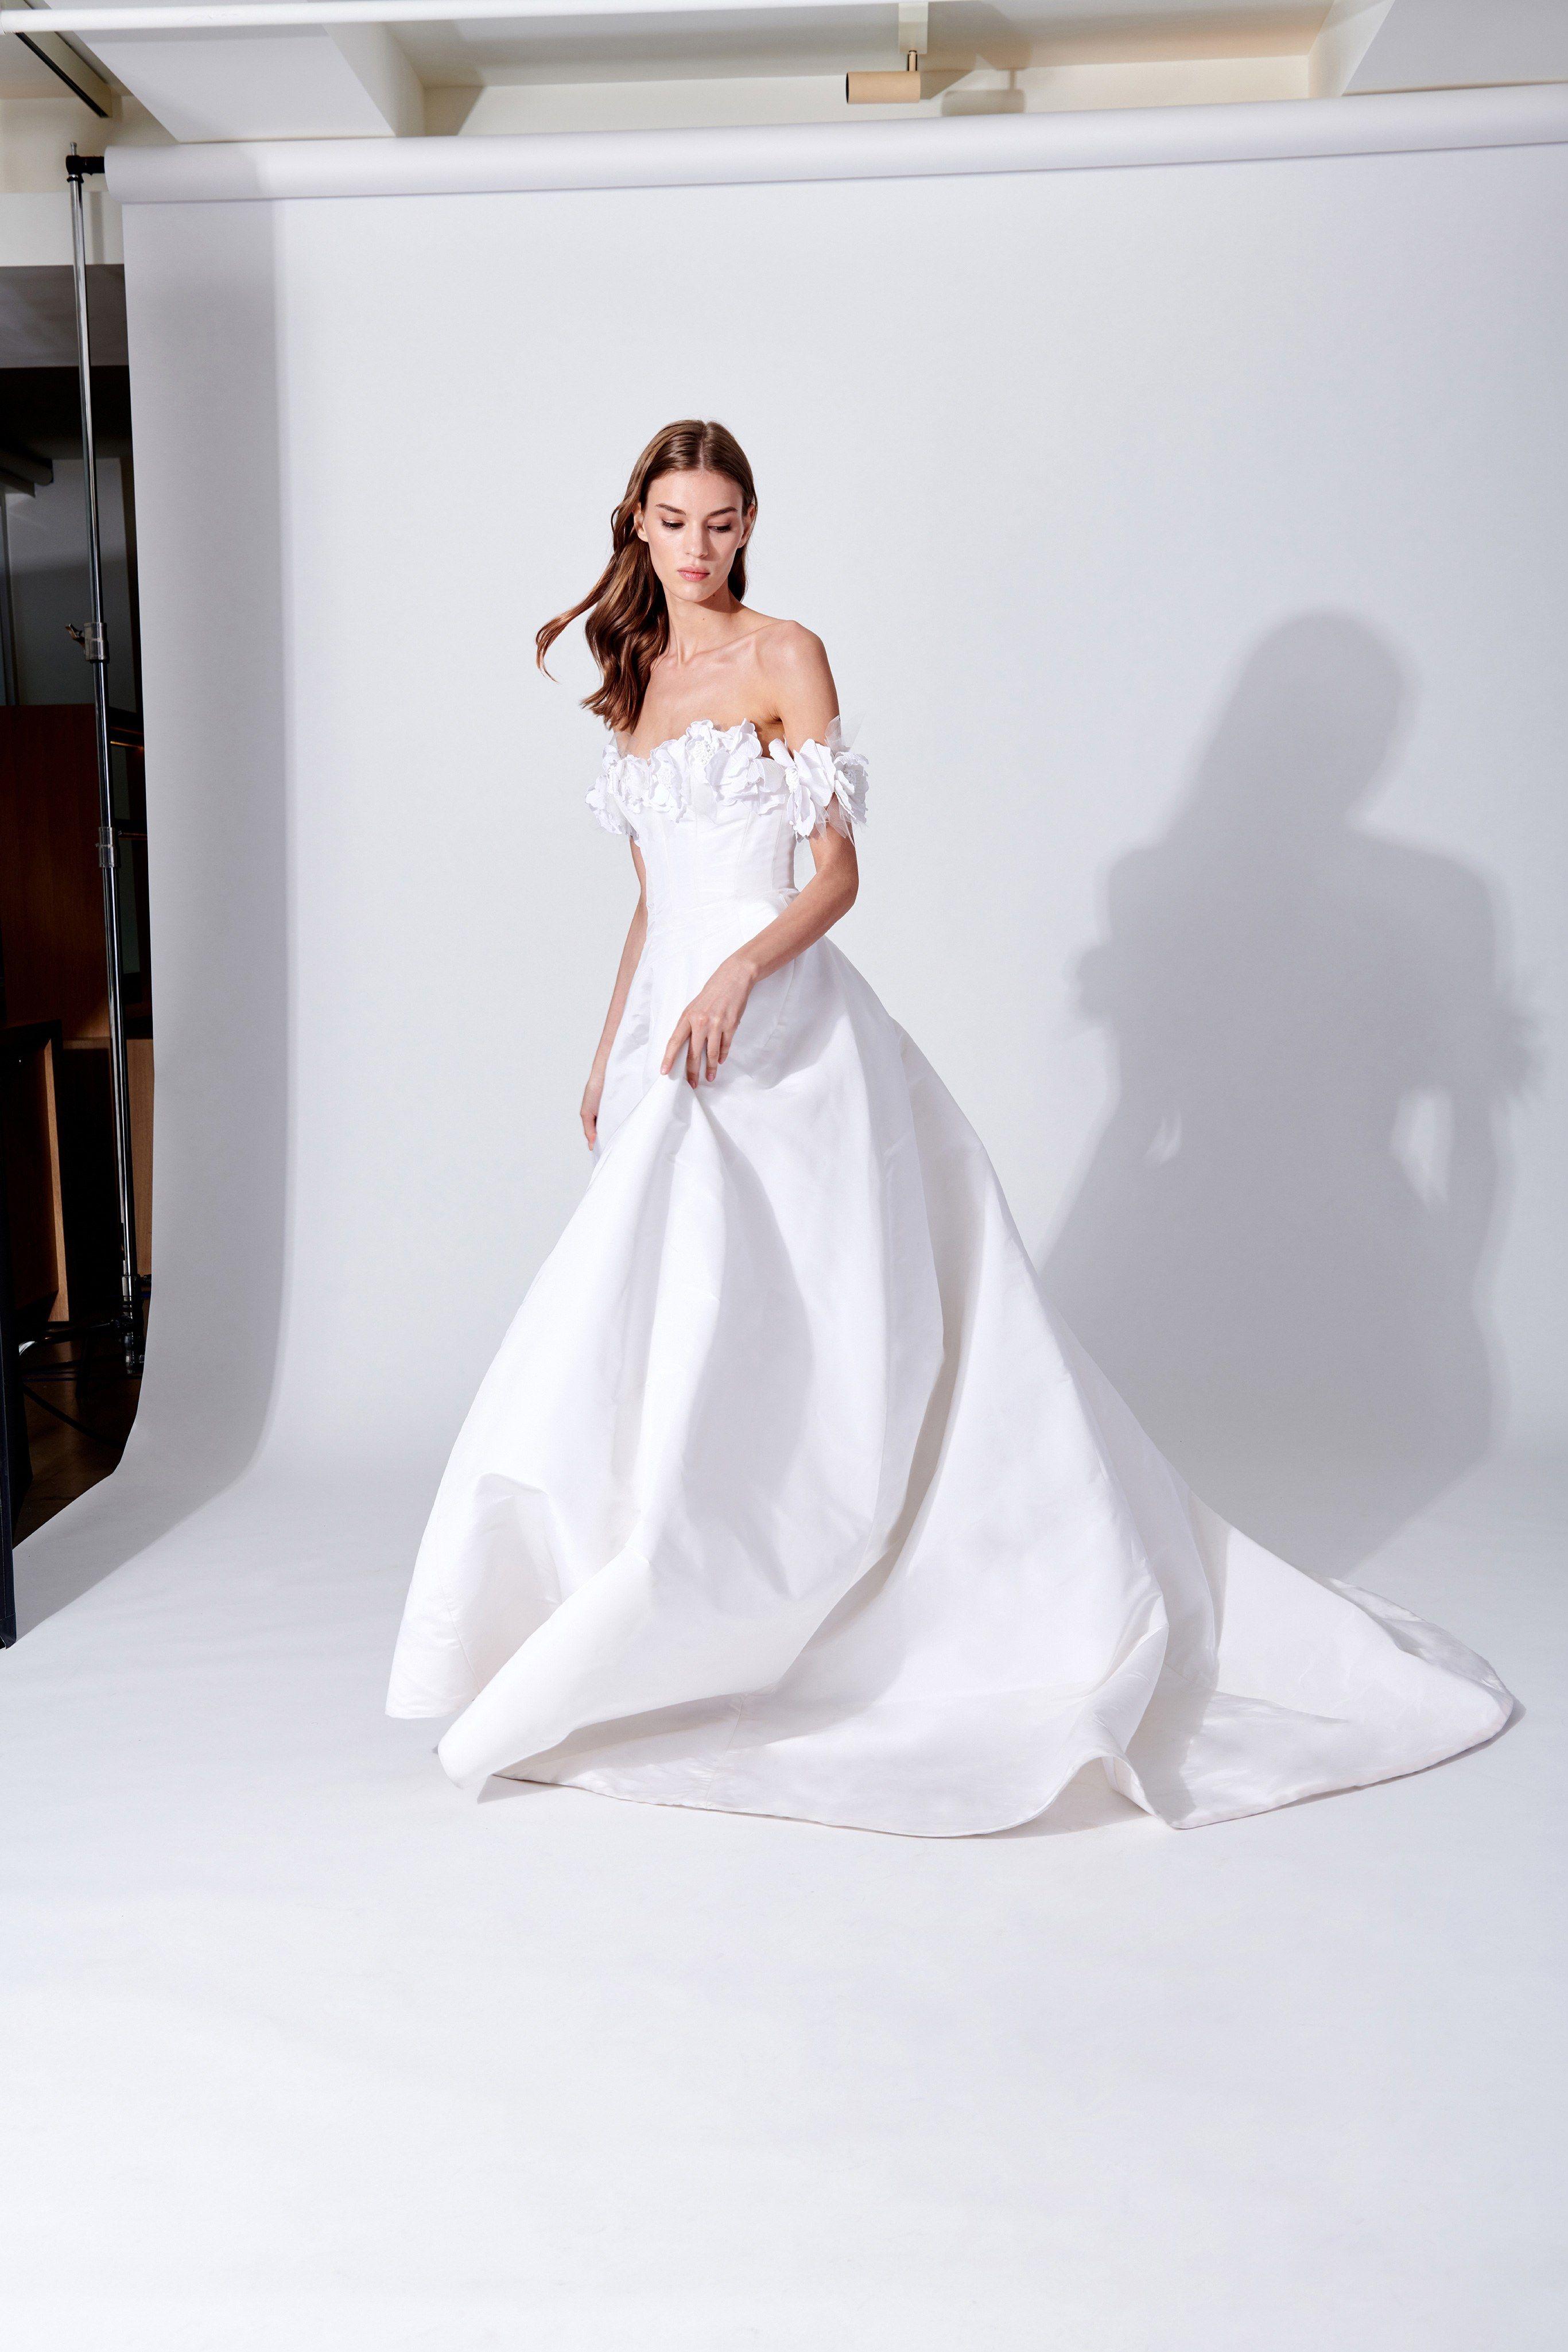 b0356bc10cee #bridal Oscar de la Renta Bridal Spring 2019 New York Collection - Vogue  #bridal #bridalgown #bridaldresses #wedding #weddingdresses